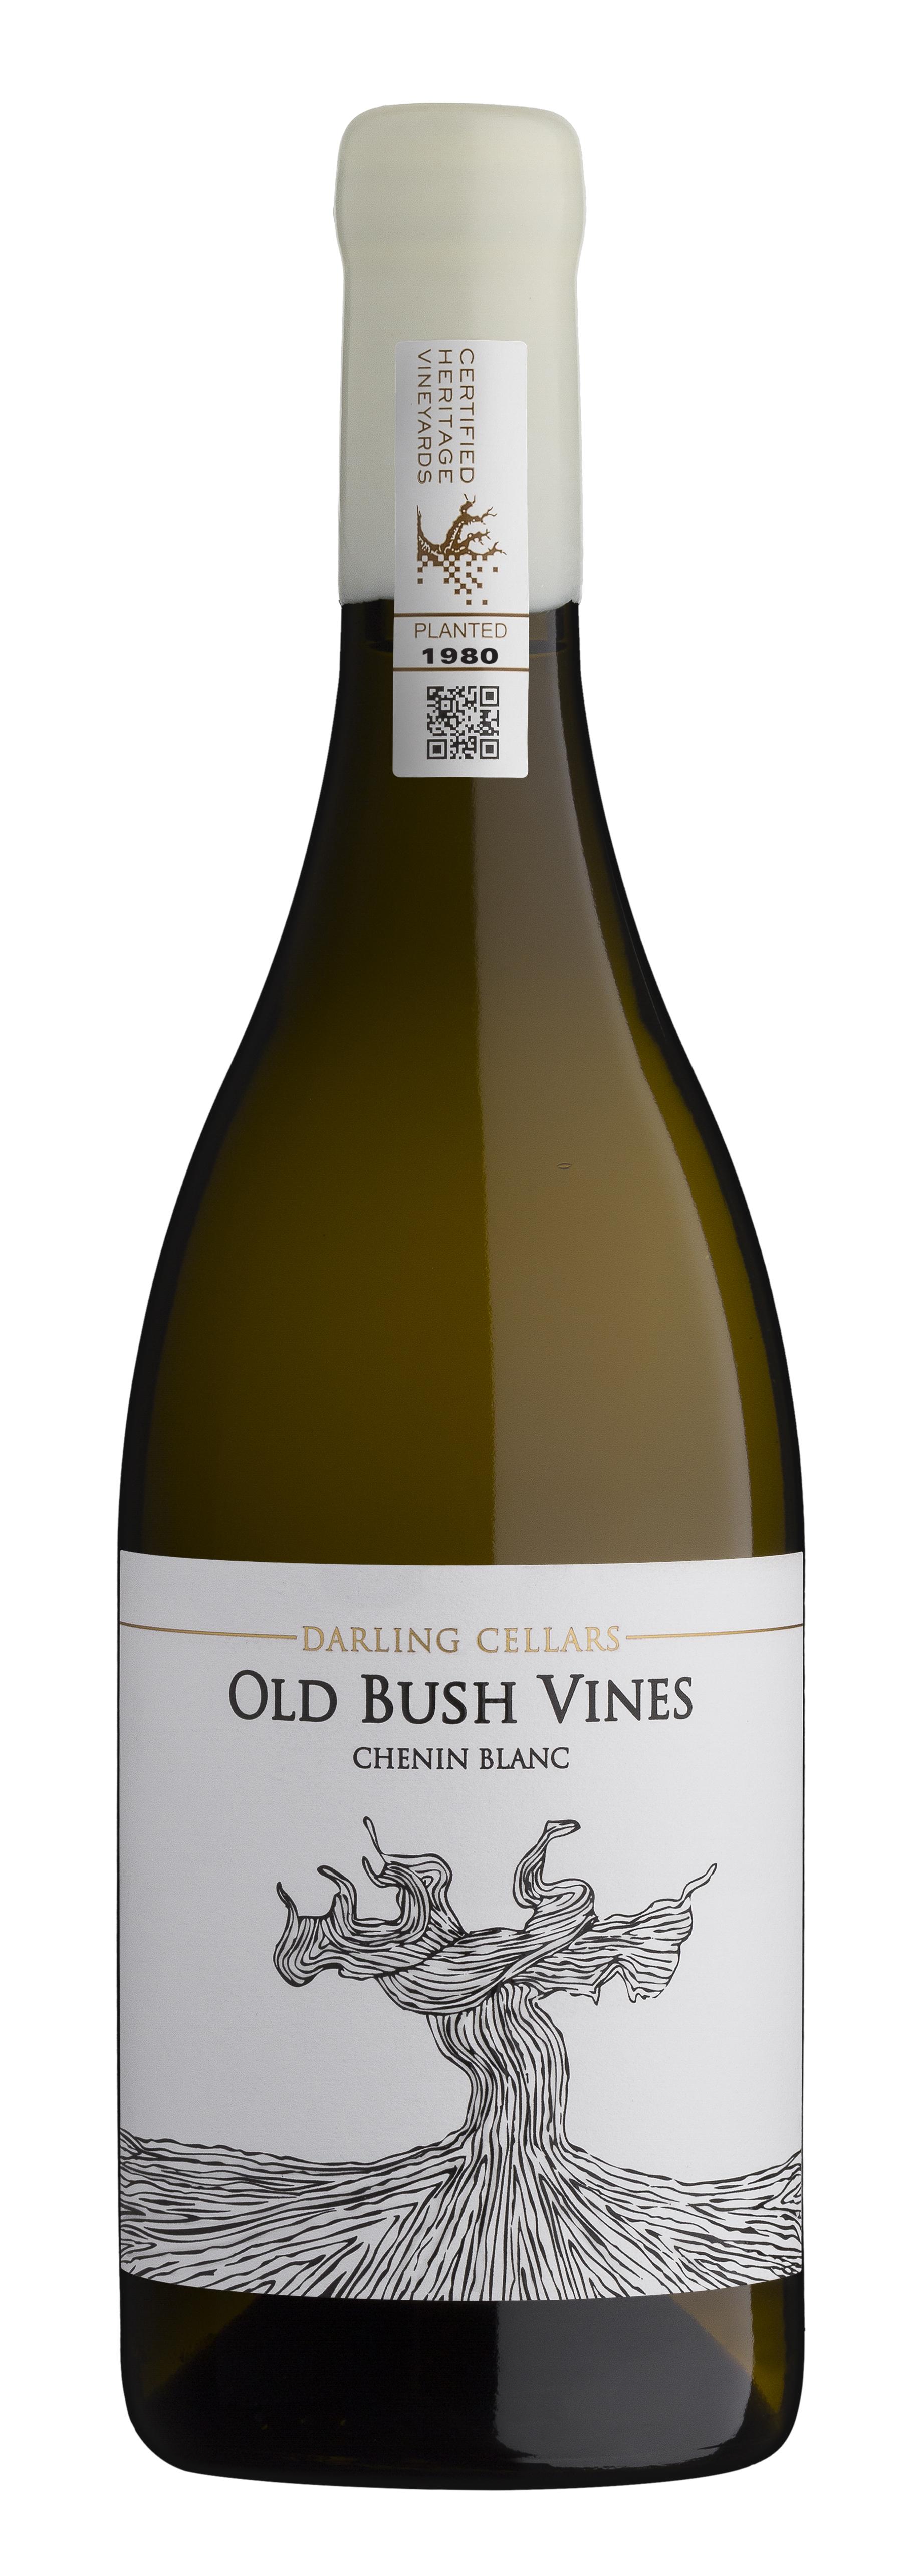 Old Bush Vines Chenin Blanc